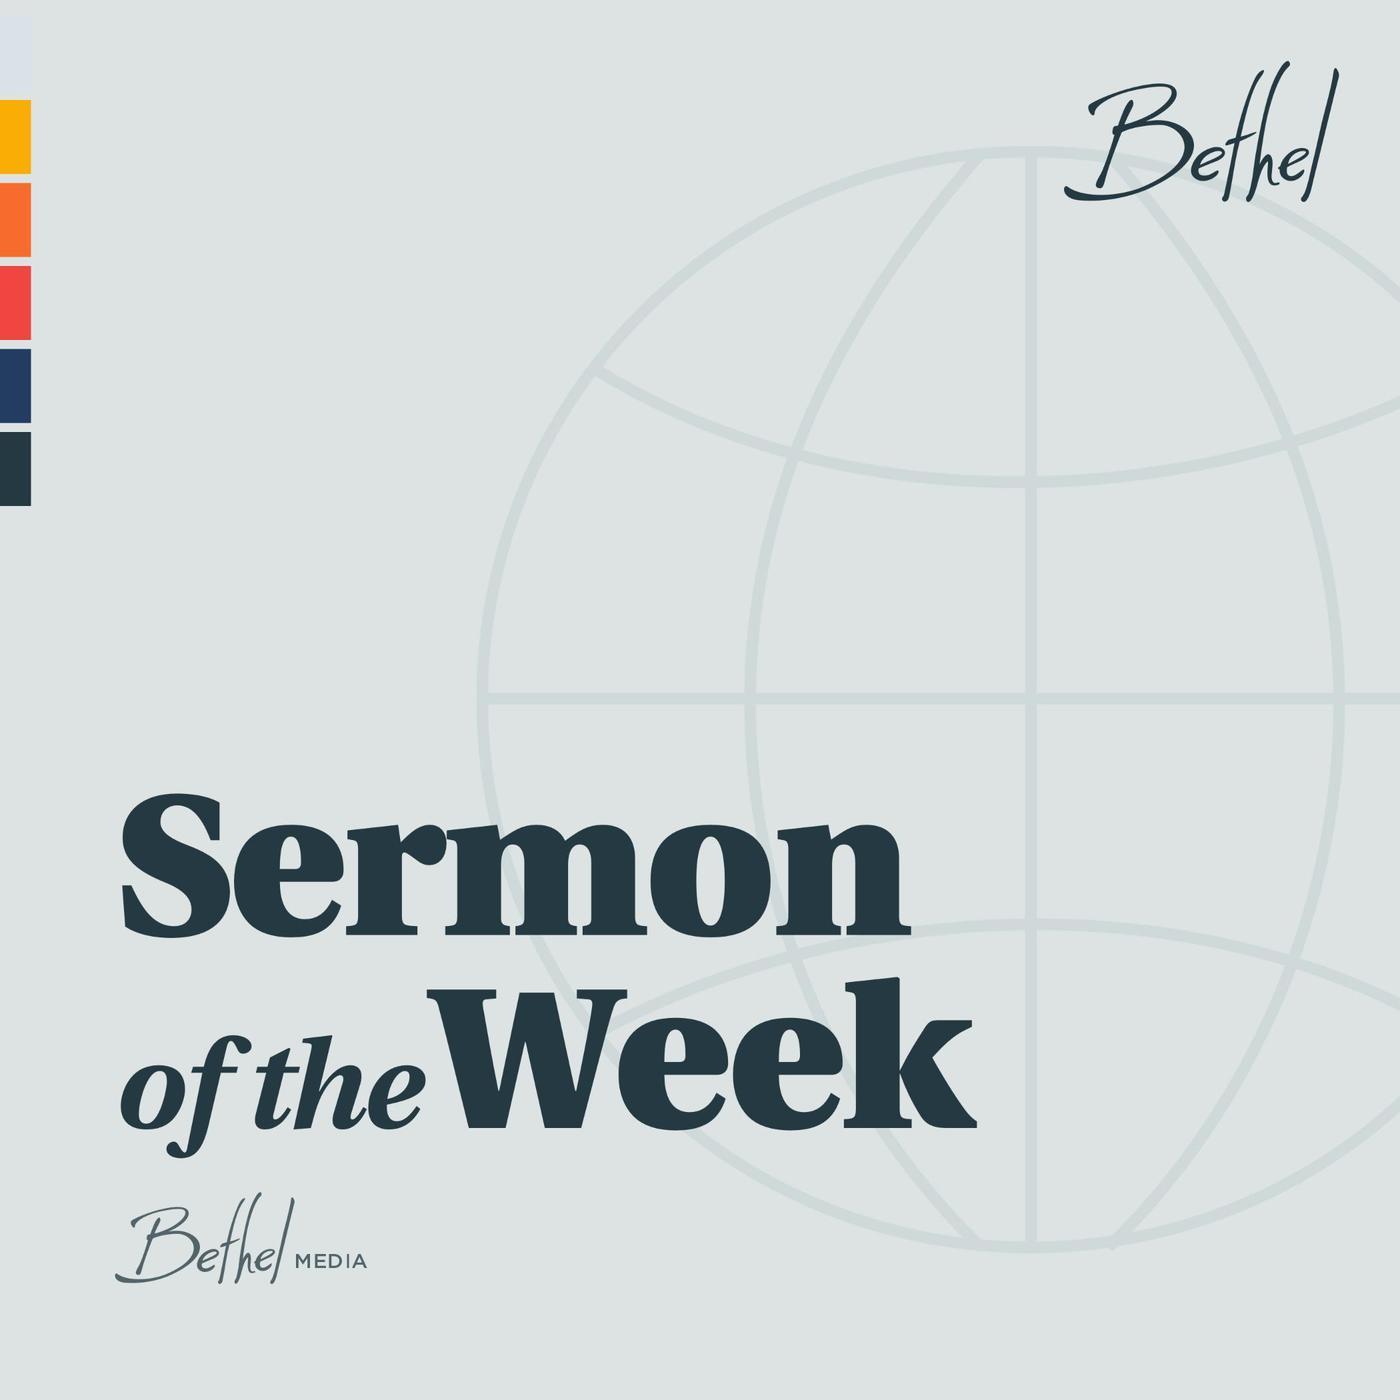 Bethel Redding Sermon of the Week